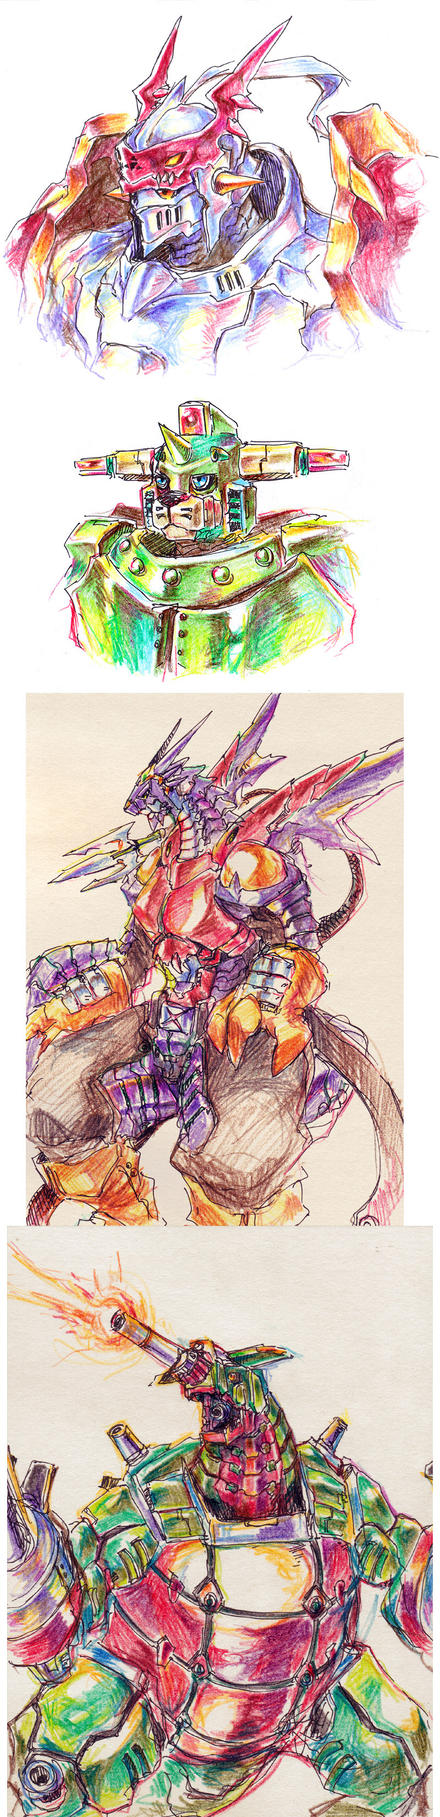 Colour pencil Digimon by Garmmon